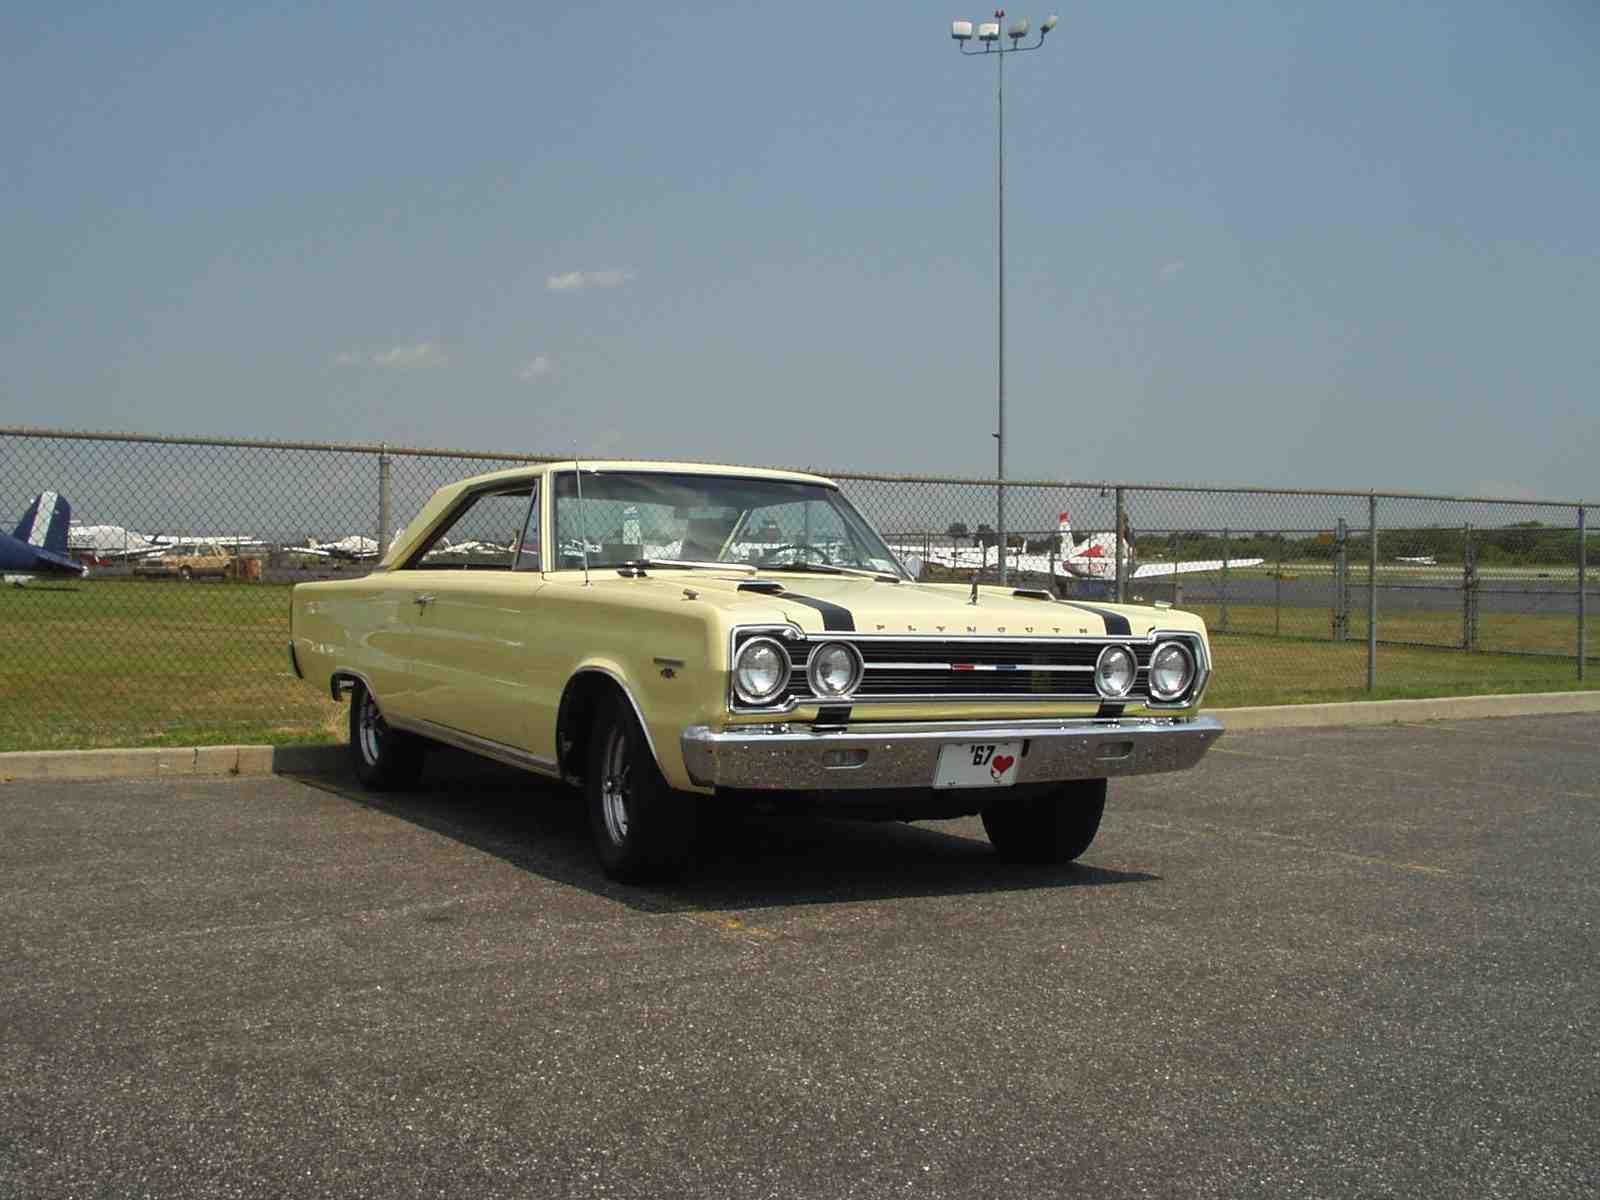 John G's 1967 GTX